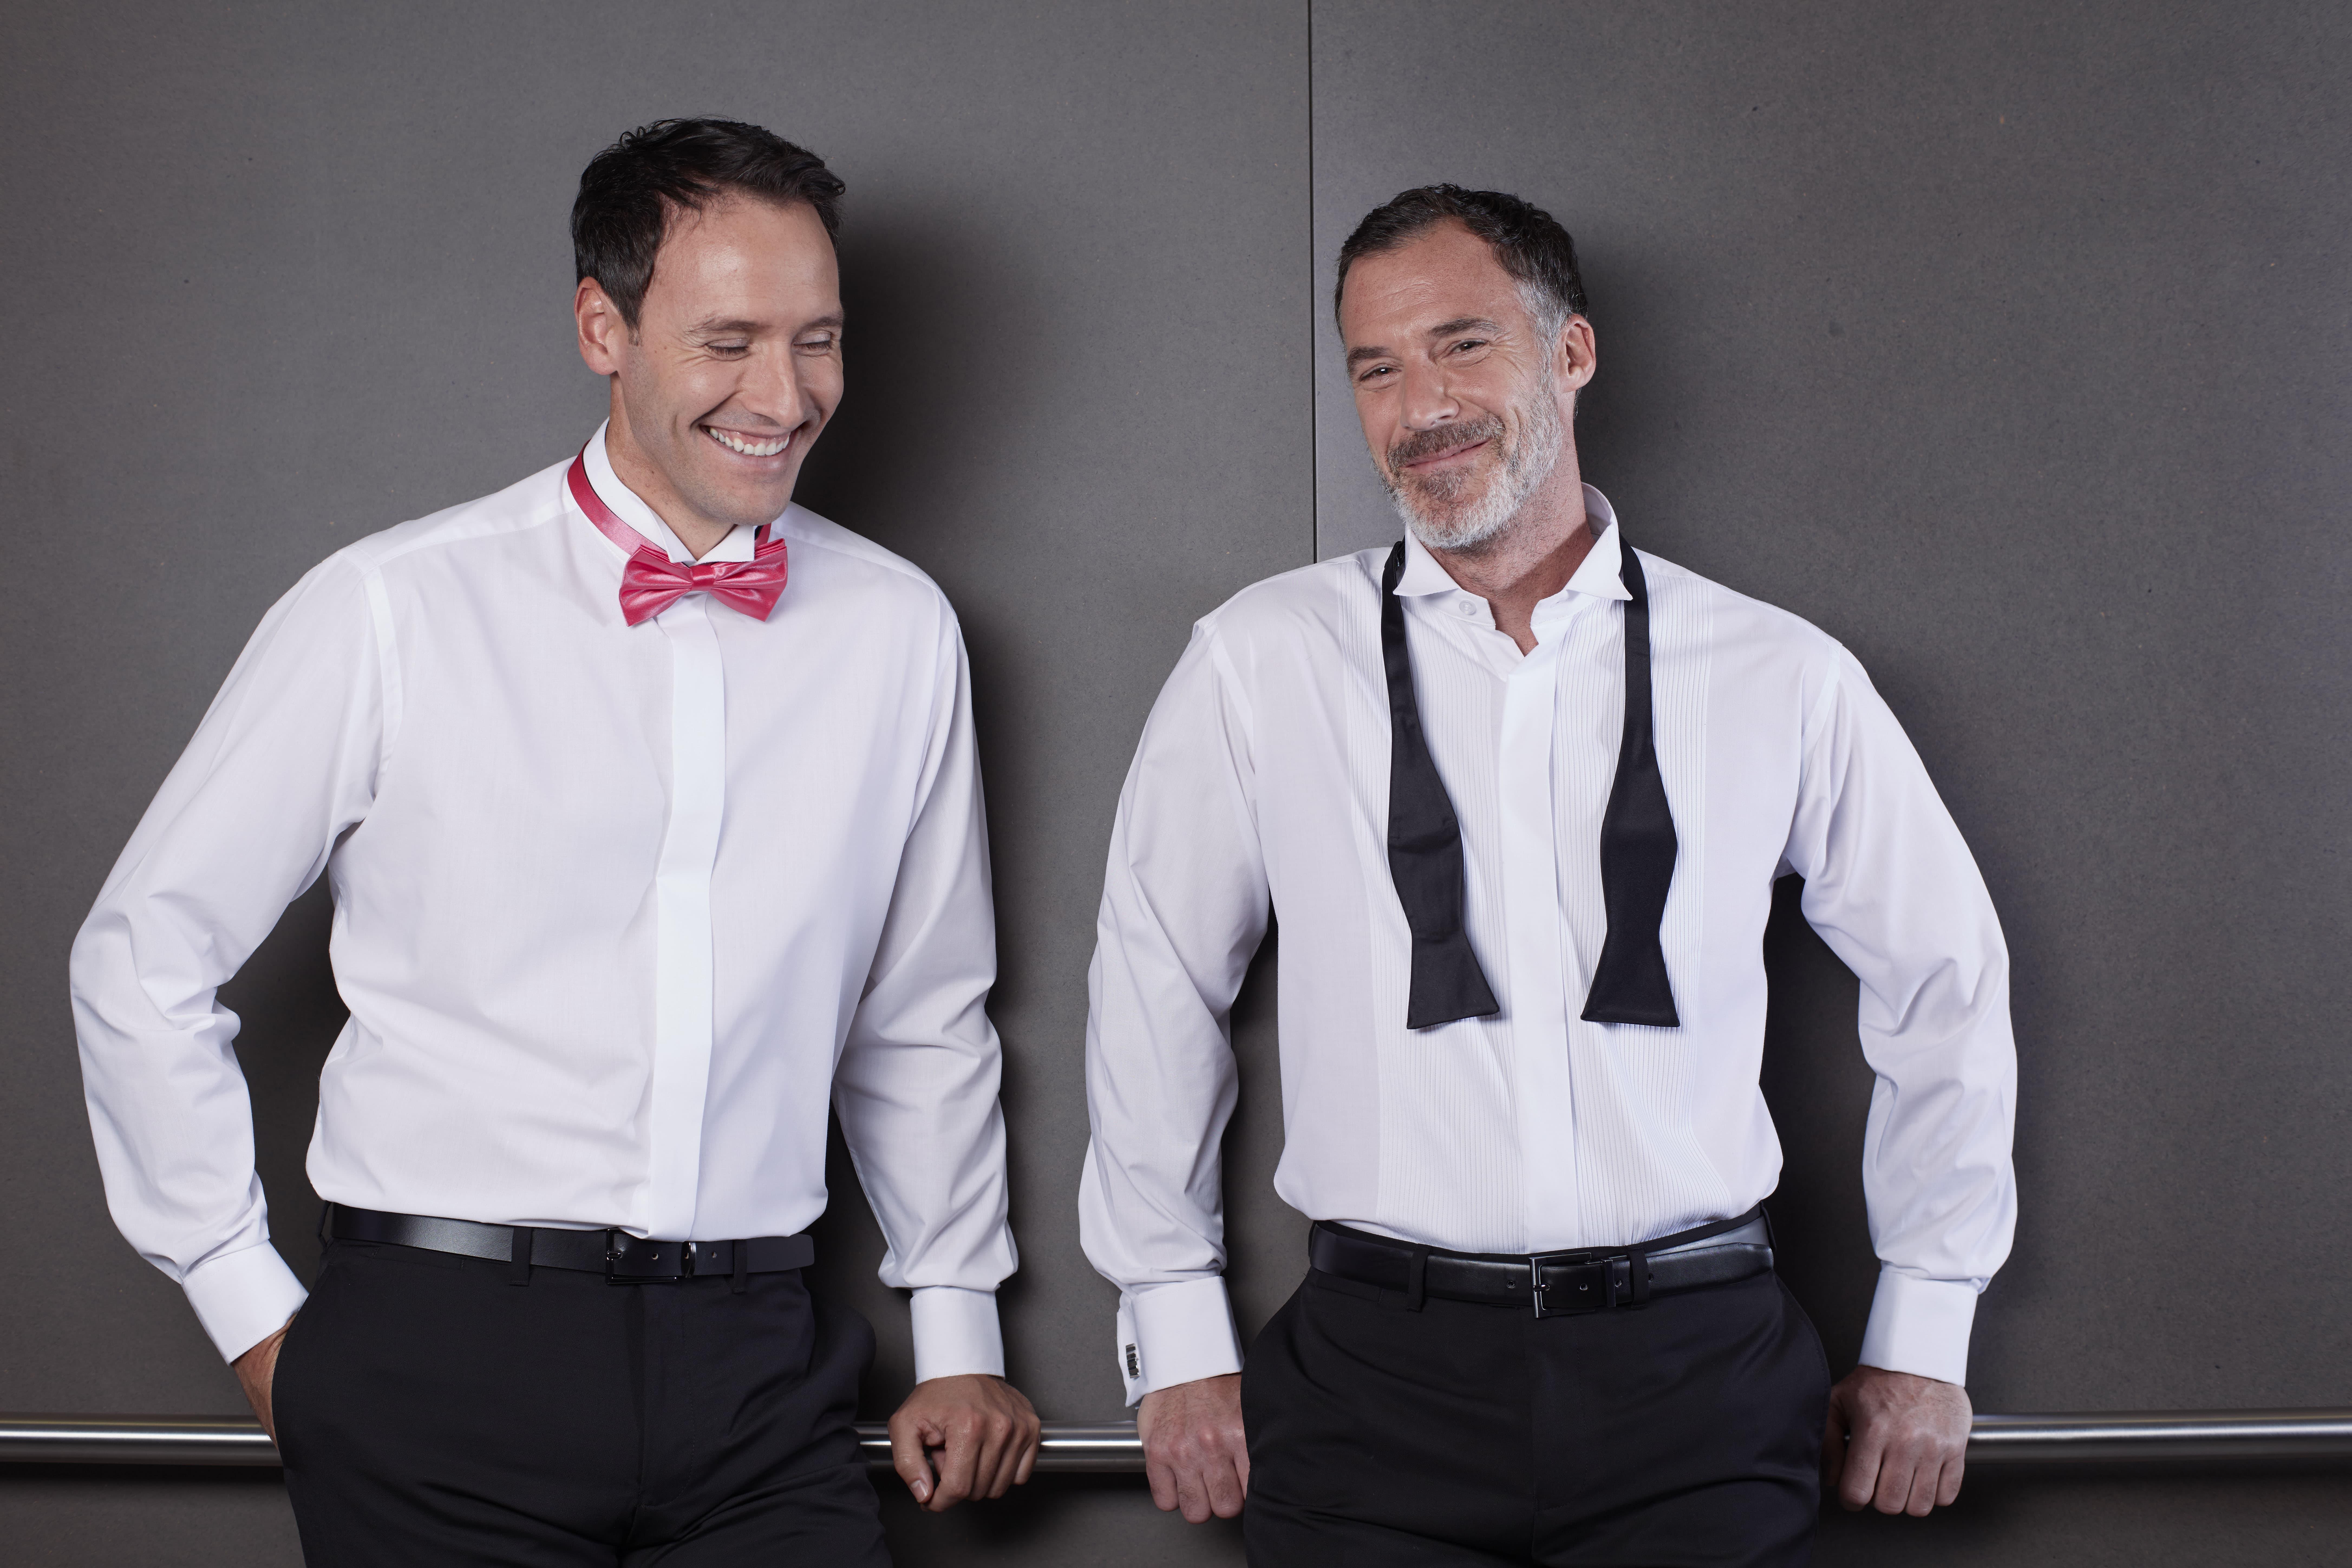 Shop Double TWO Men's Evening Shirts